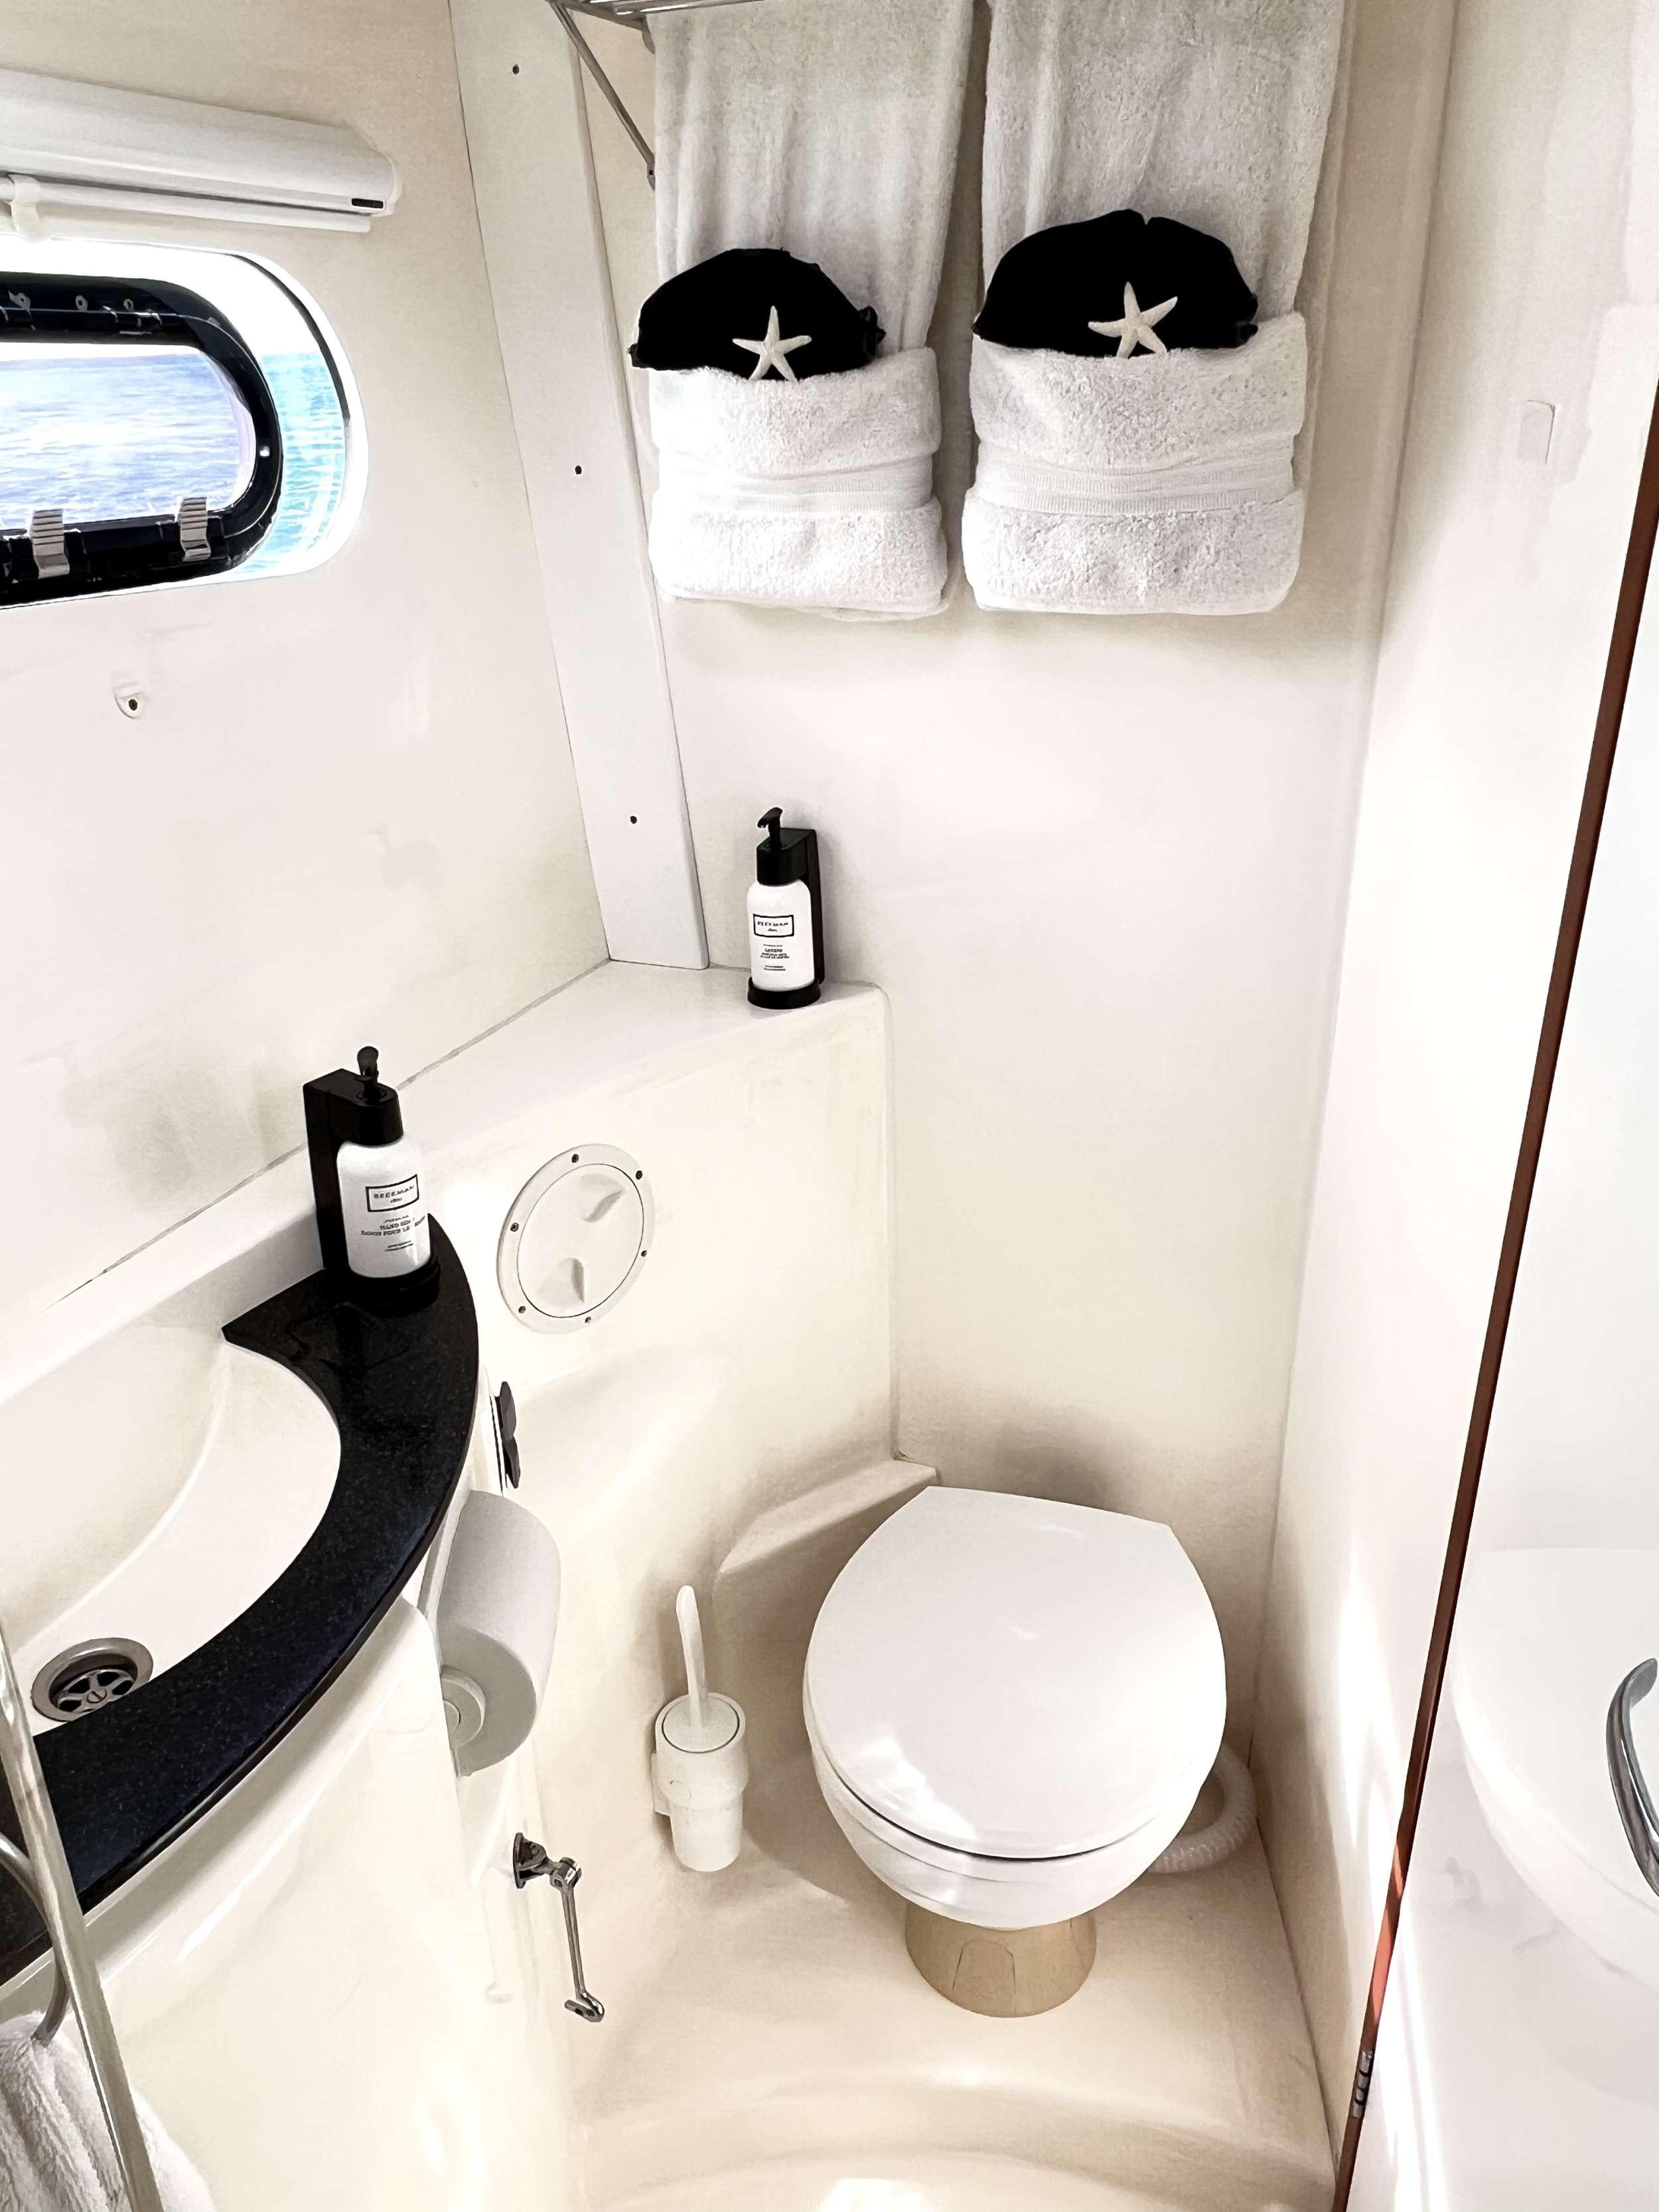 En suite Bathrooms/Showers in each cabin. (All bathrooms and showers are identical in all cabins.)